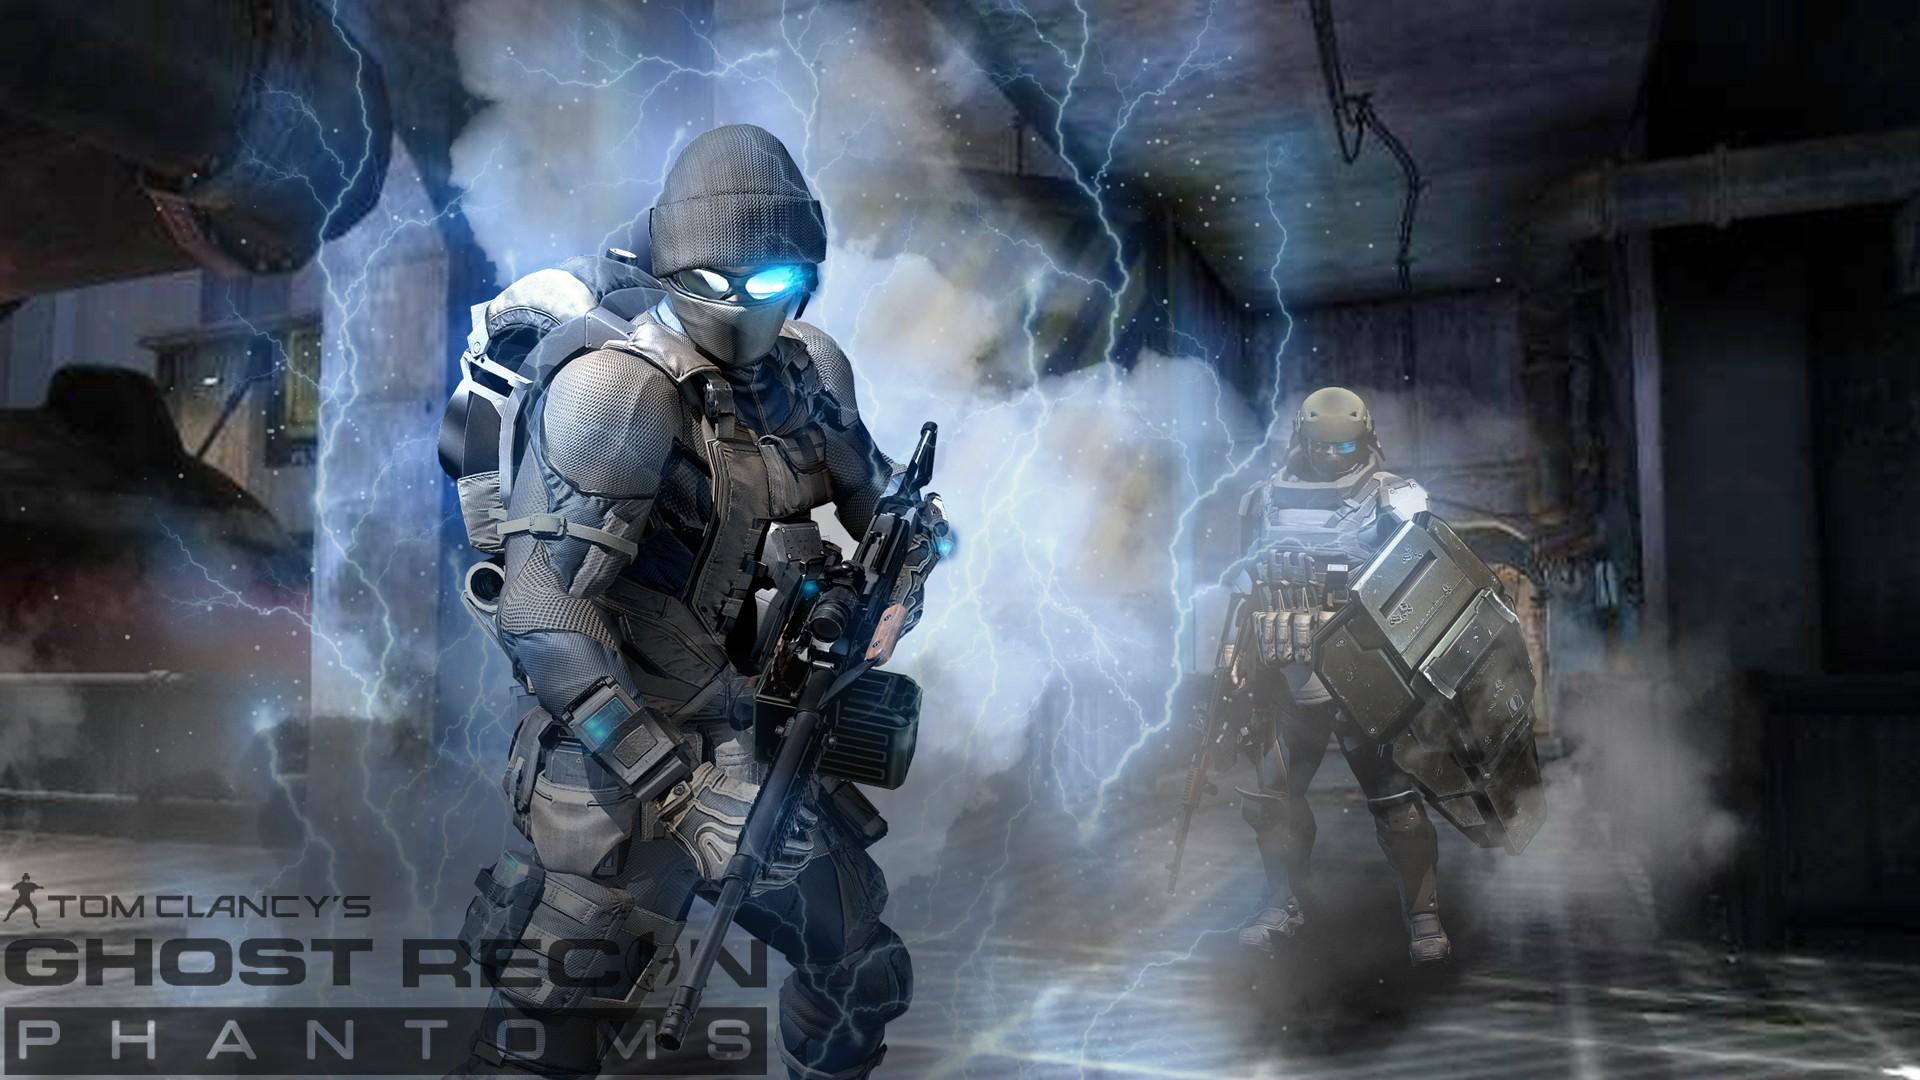 Ghost Recon Tom Clancy Phantoms